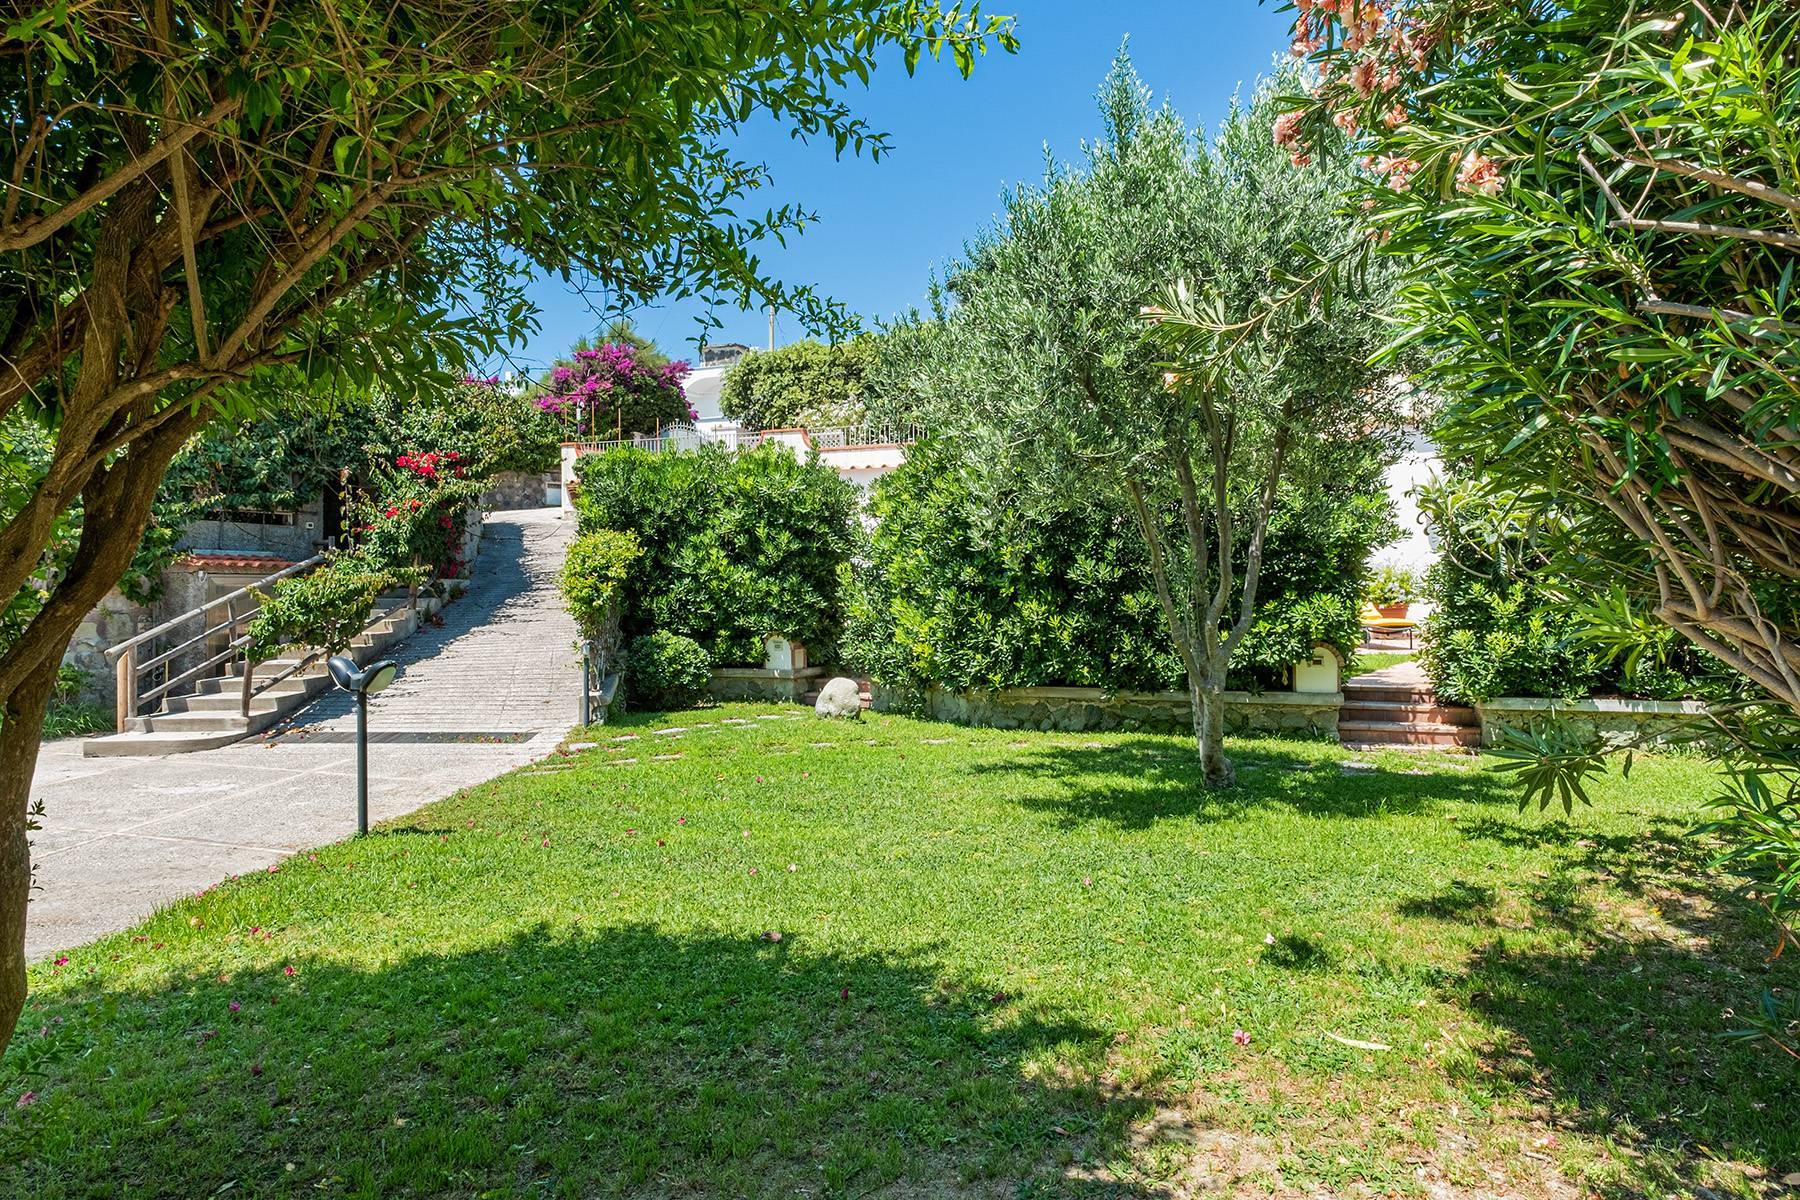 Villa in Vendita a Ischia: 5 locali, 400 mq - Foto 18